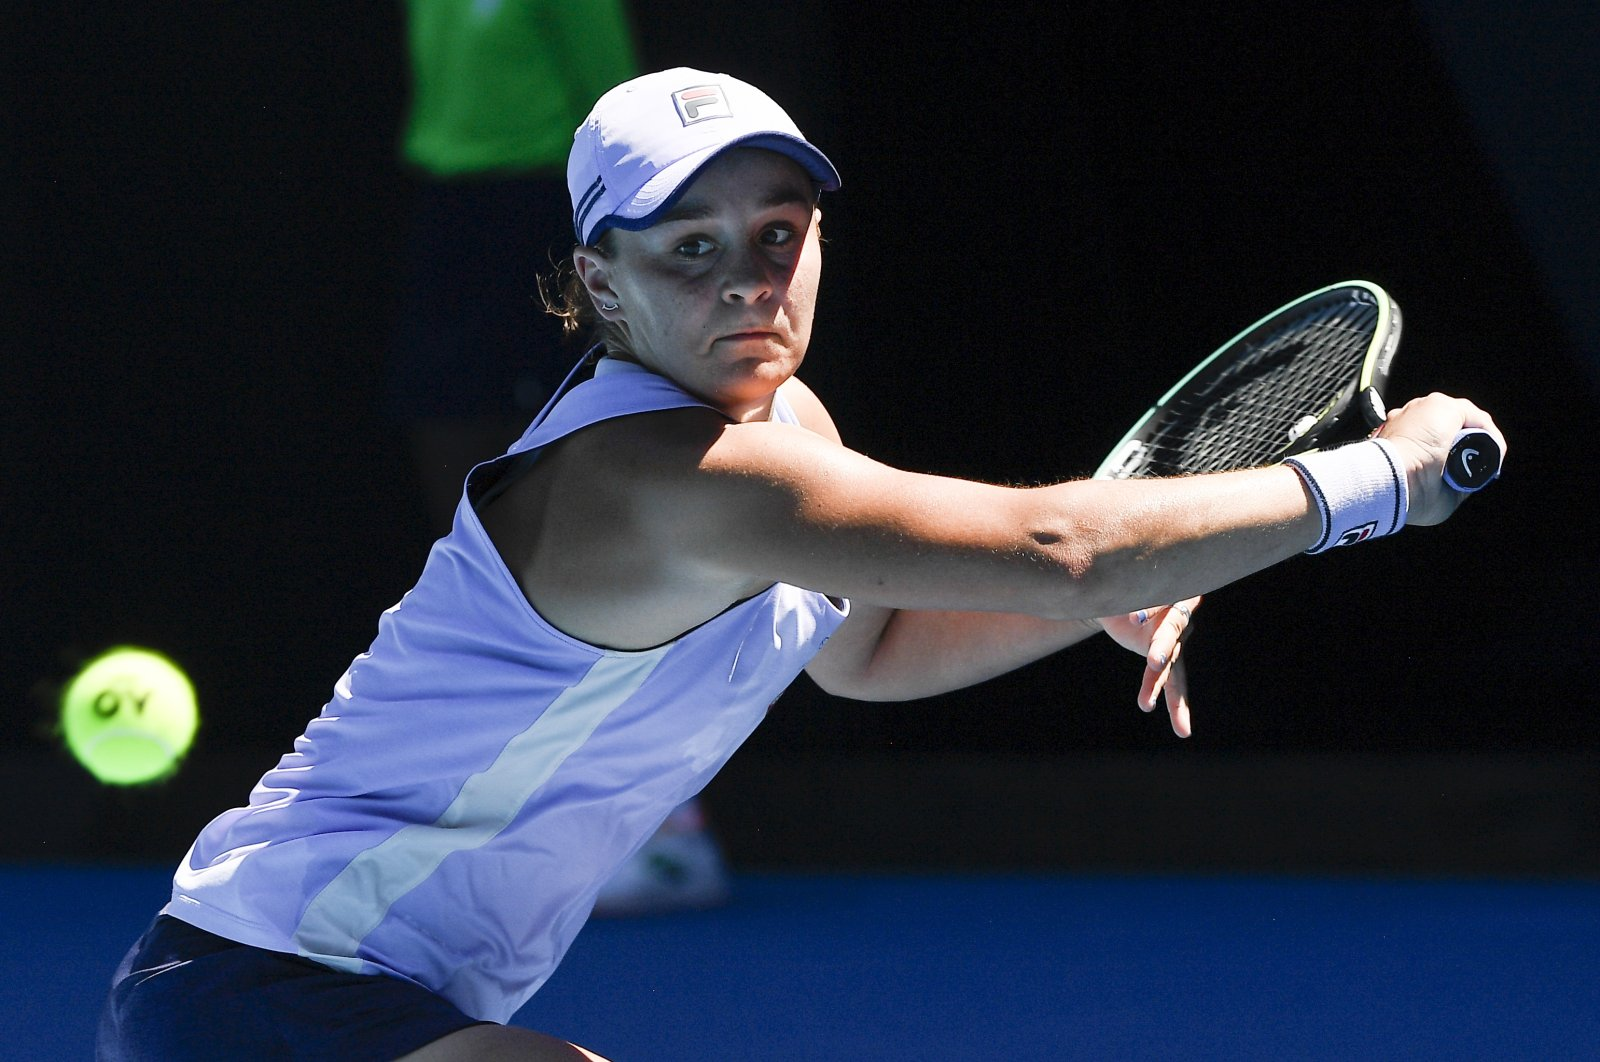 Australia's Ash Barty in action during an Australian Open tennis match against Karolina Muchova, in Melbourne, Australia, Feb. 17, 2021. (AP Photo)